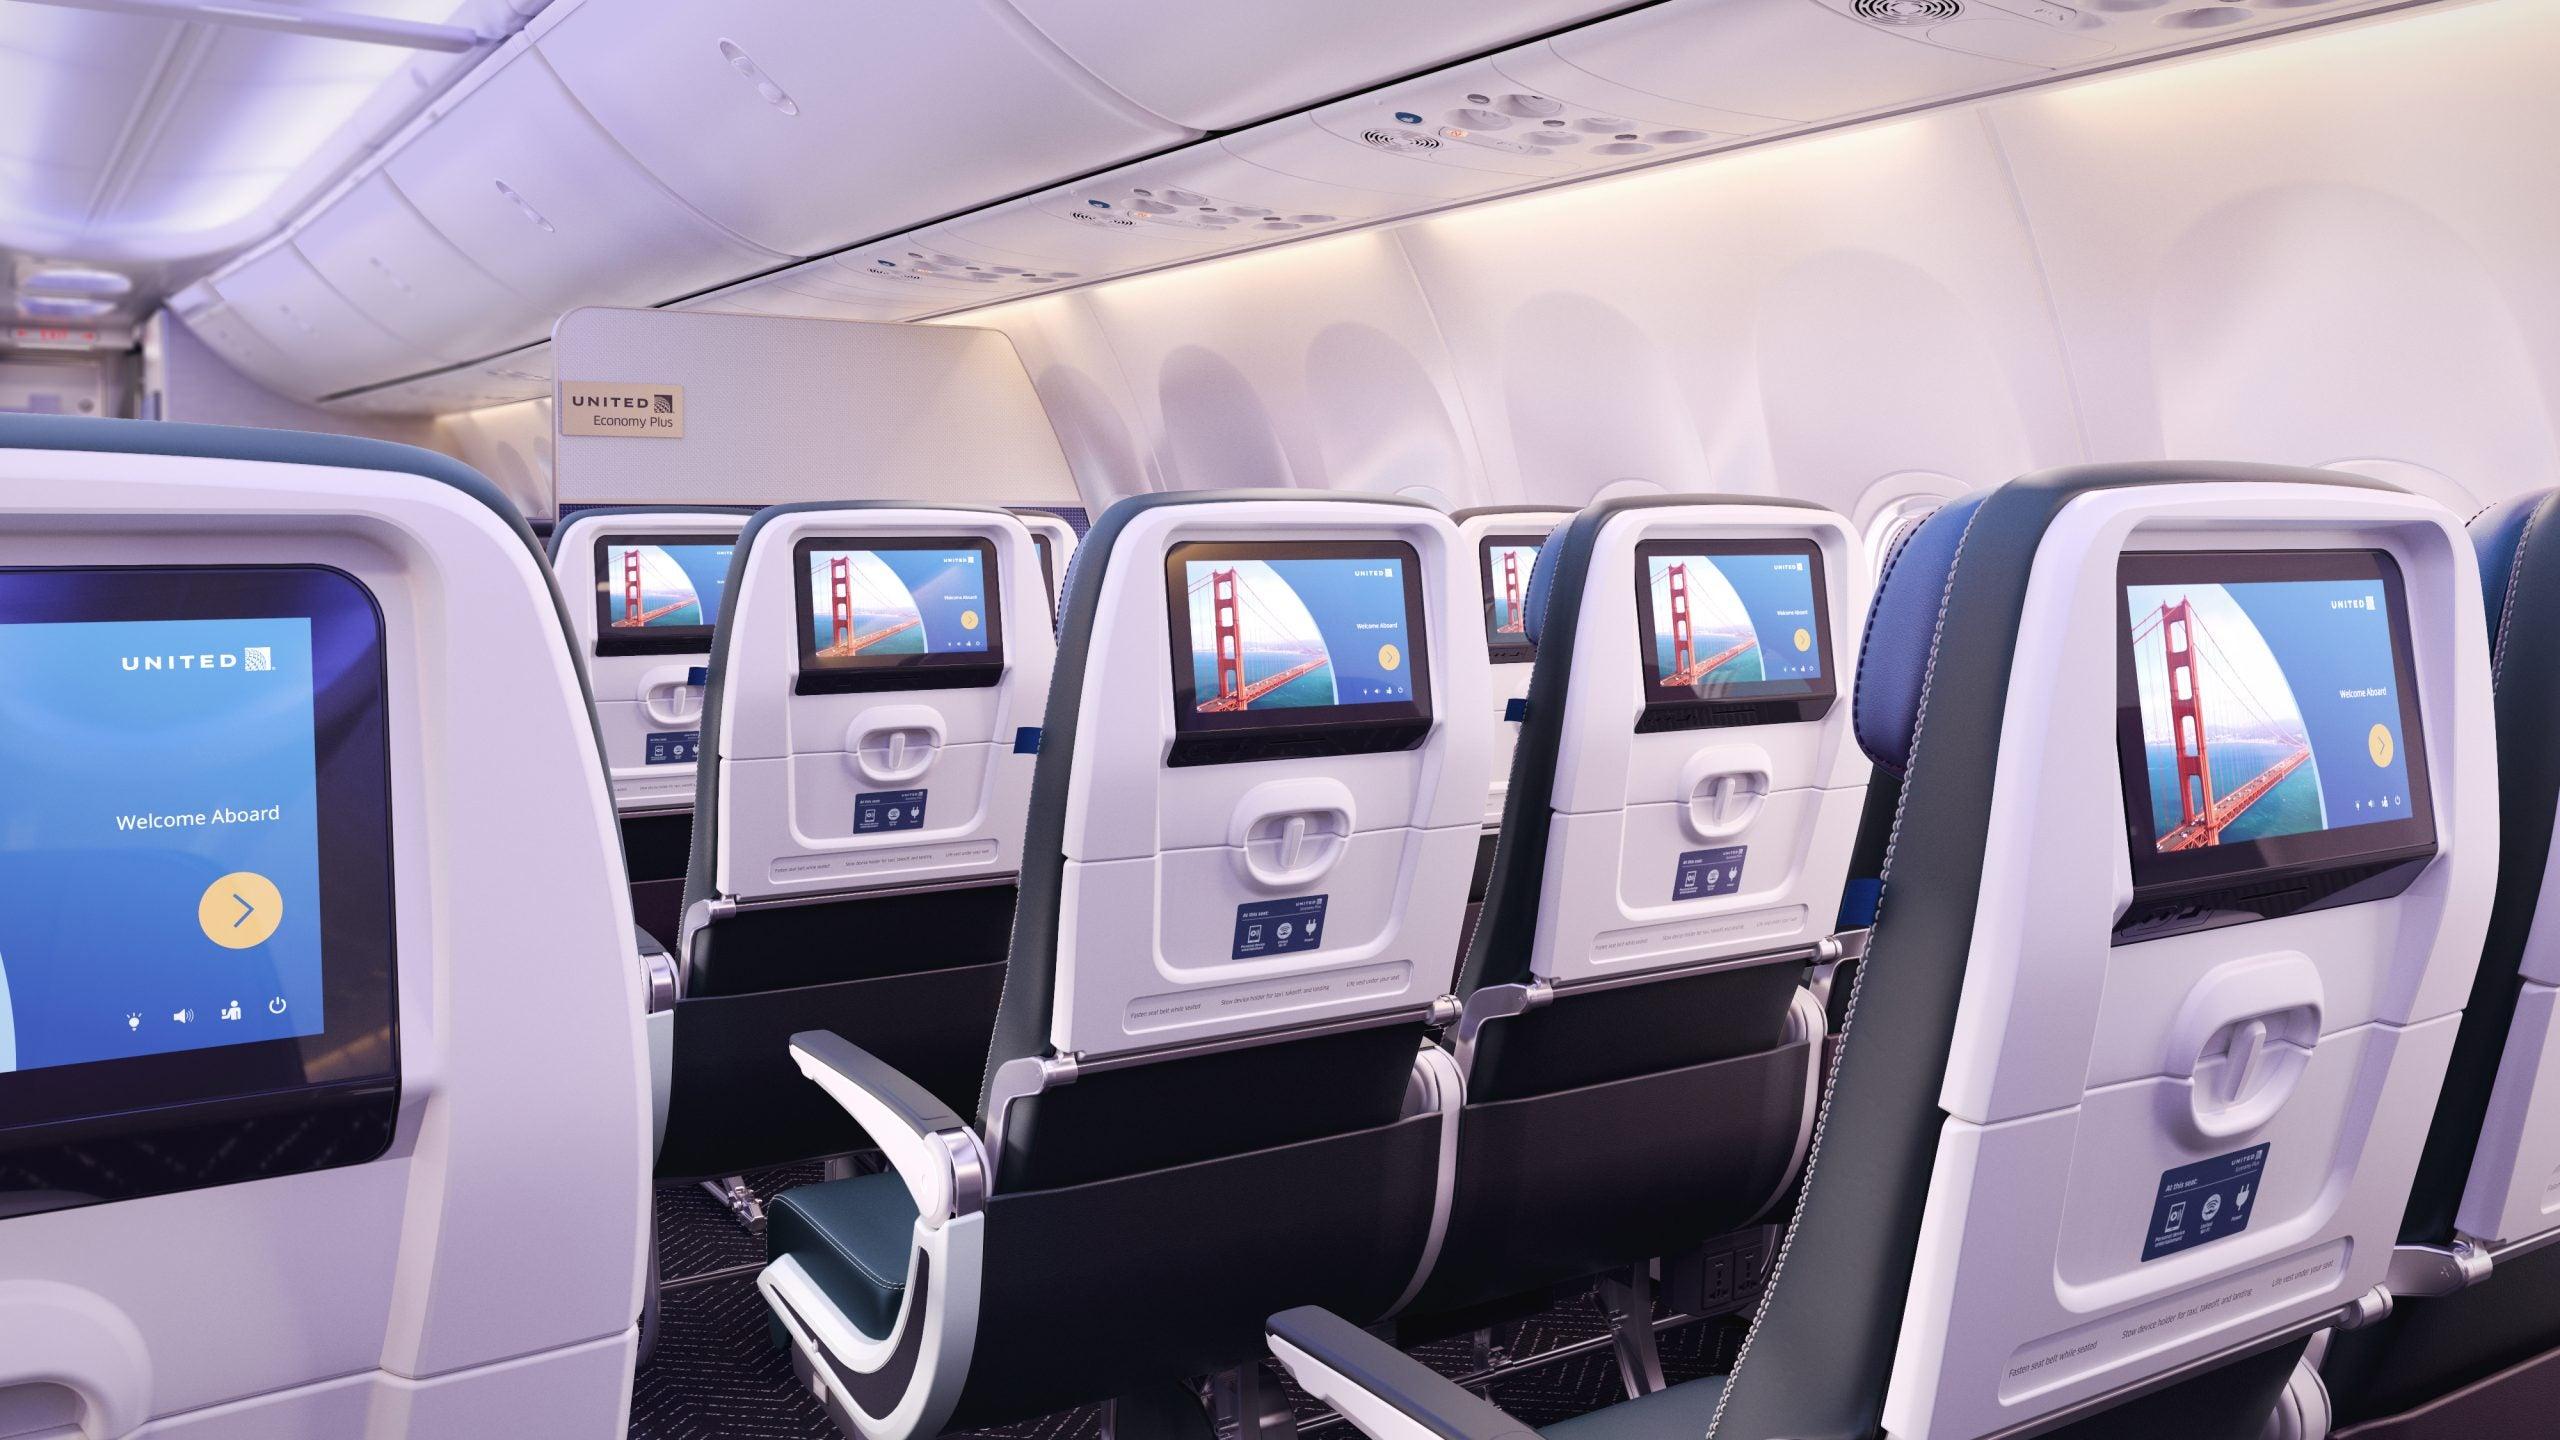 United places massive aircraft order, announces new narrow-body cabin  interiors and retrofit program